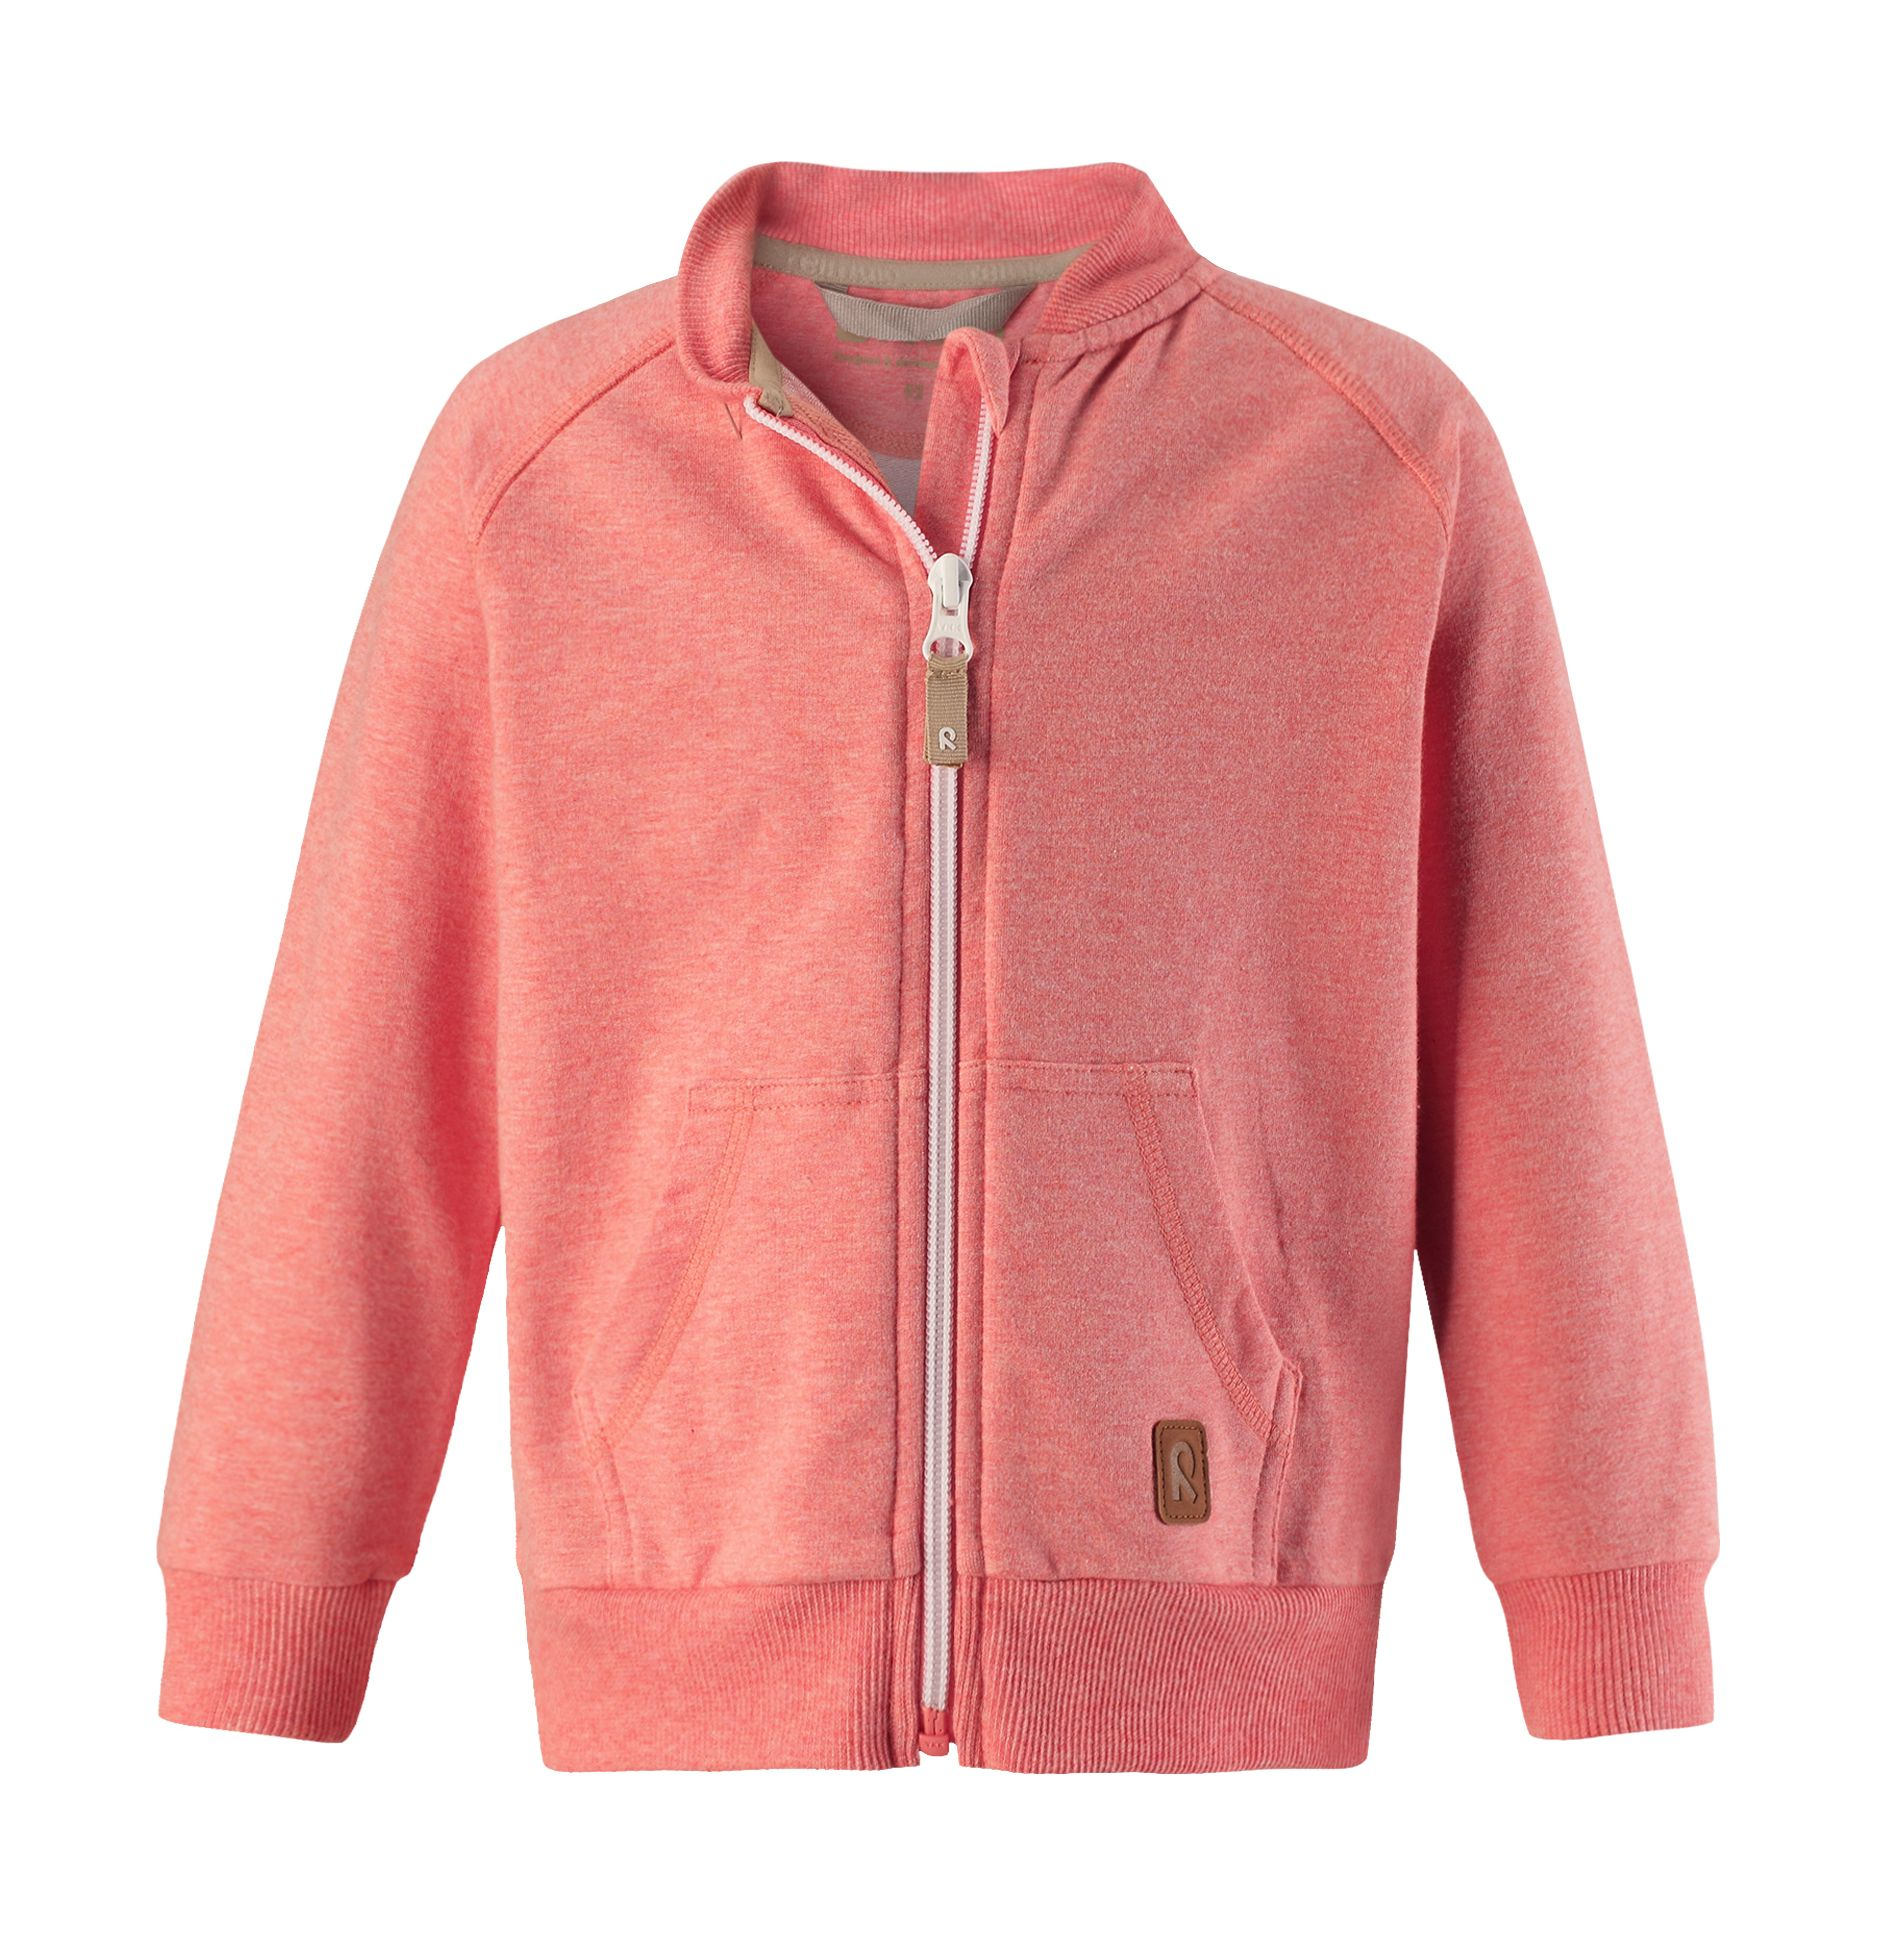 REIMA Toutain Coral Pink 98